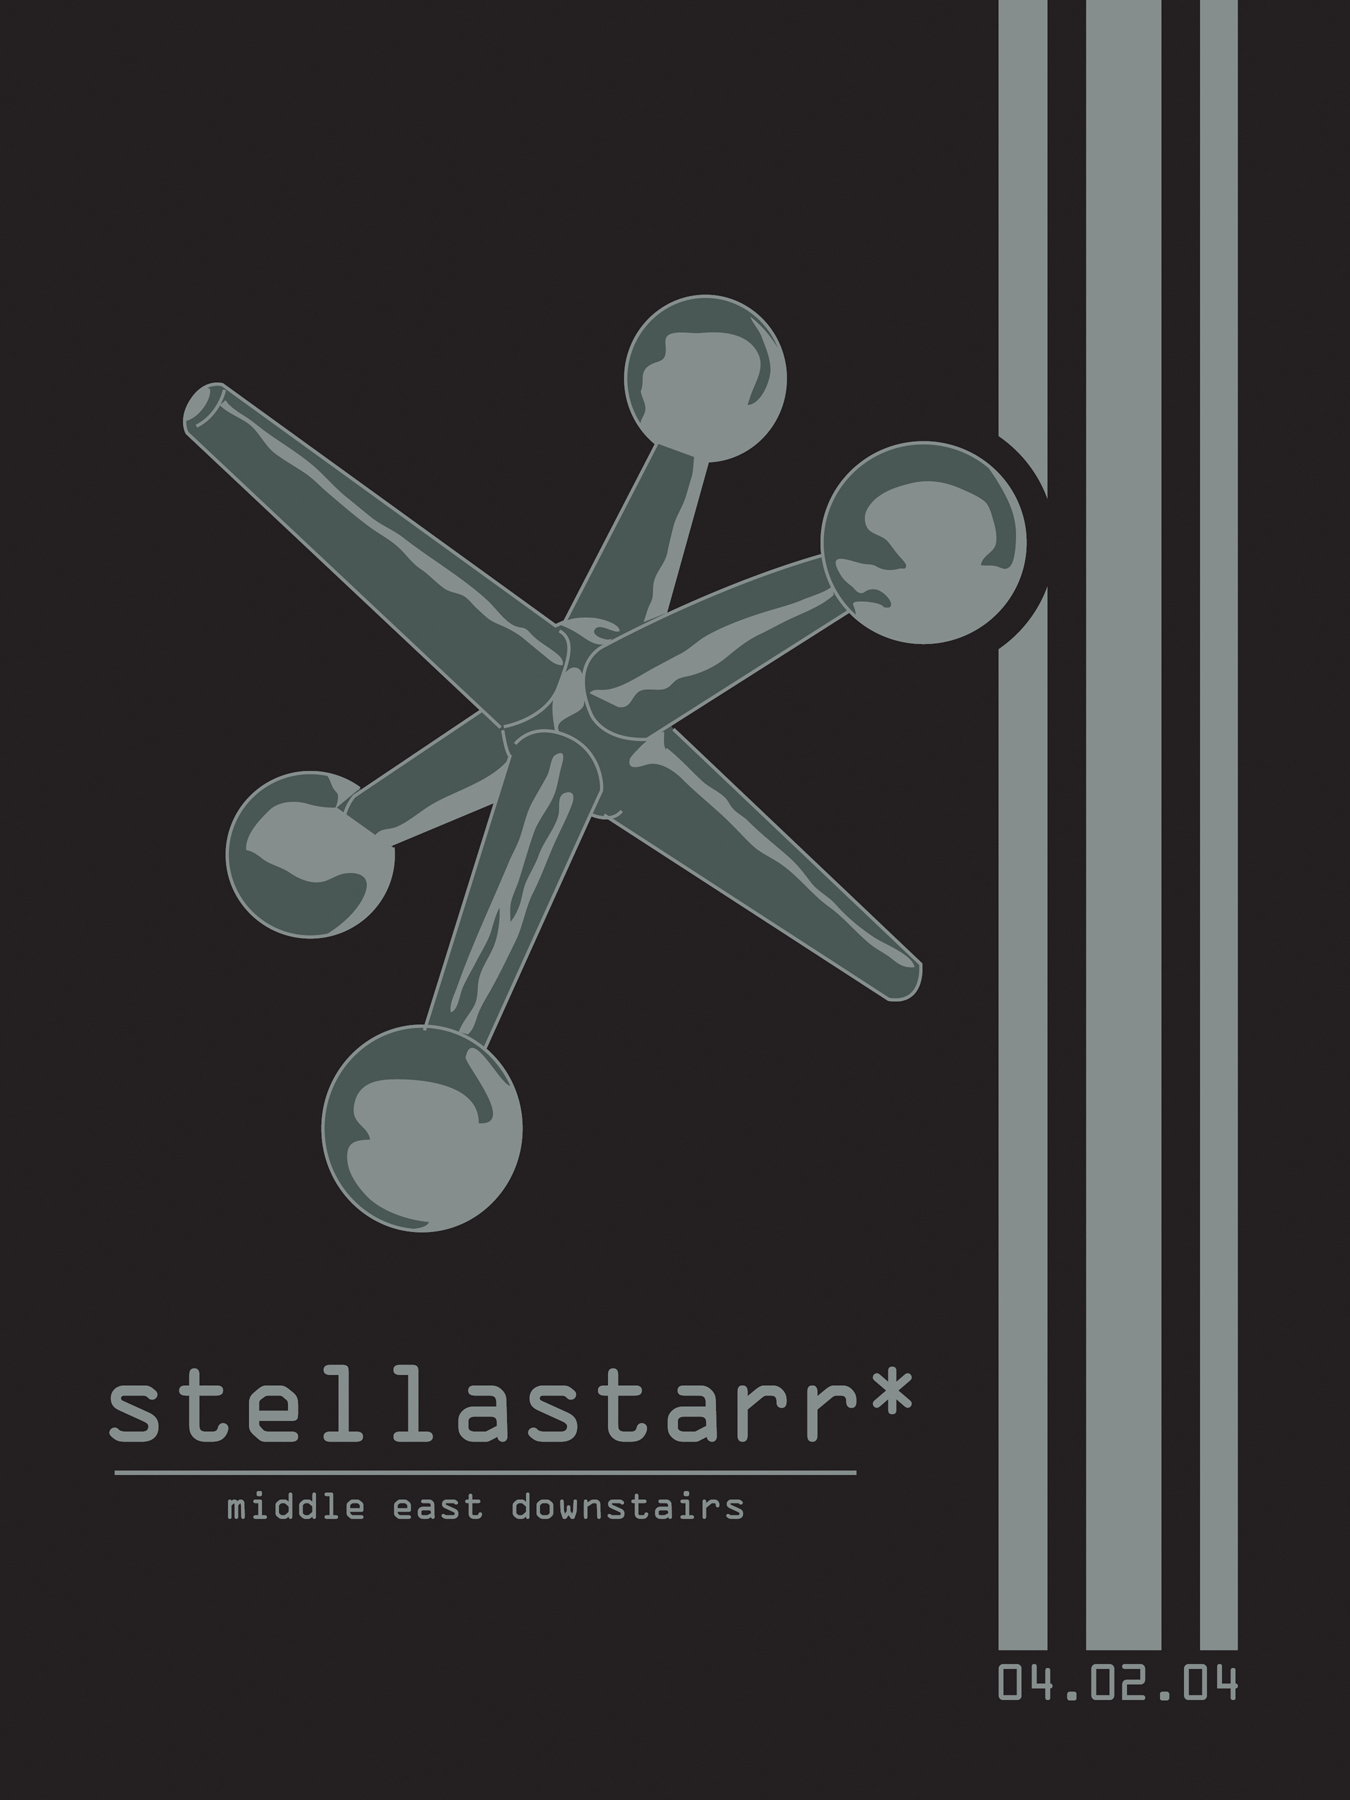 stellastarr DC.jpg